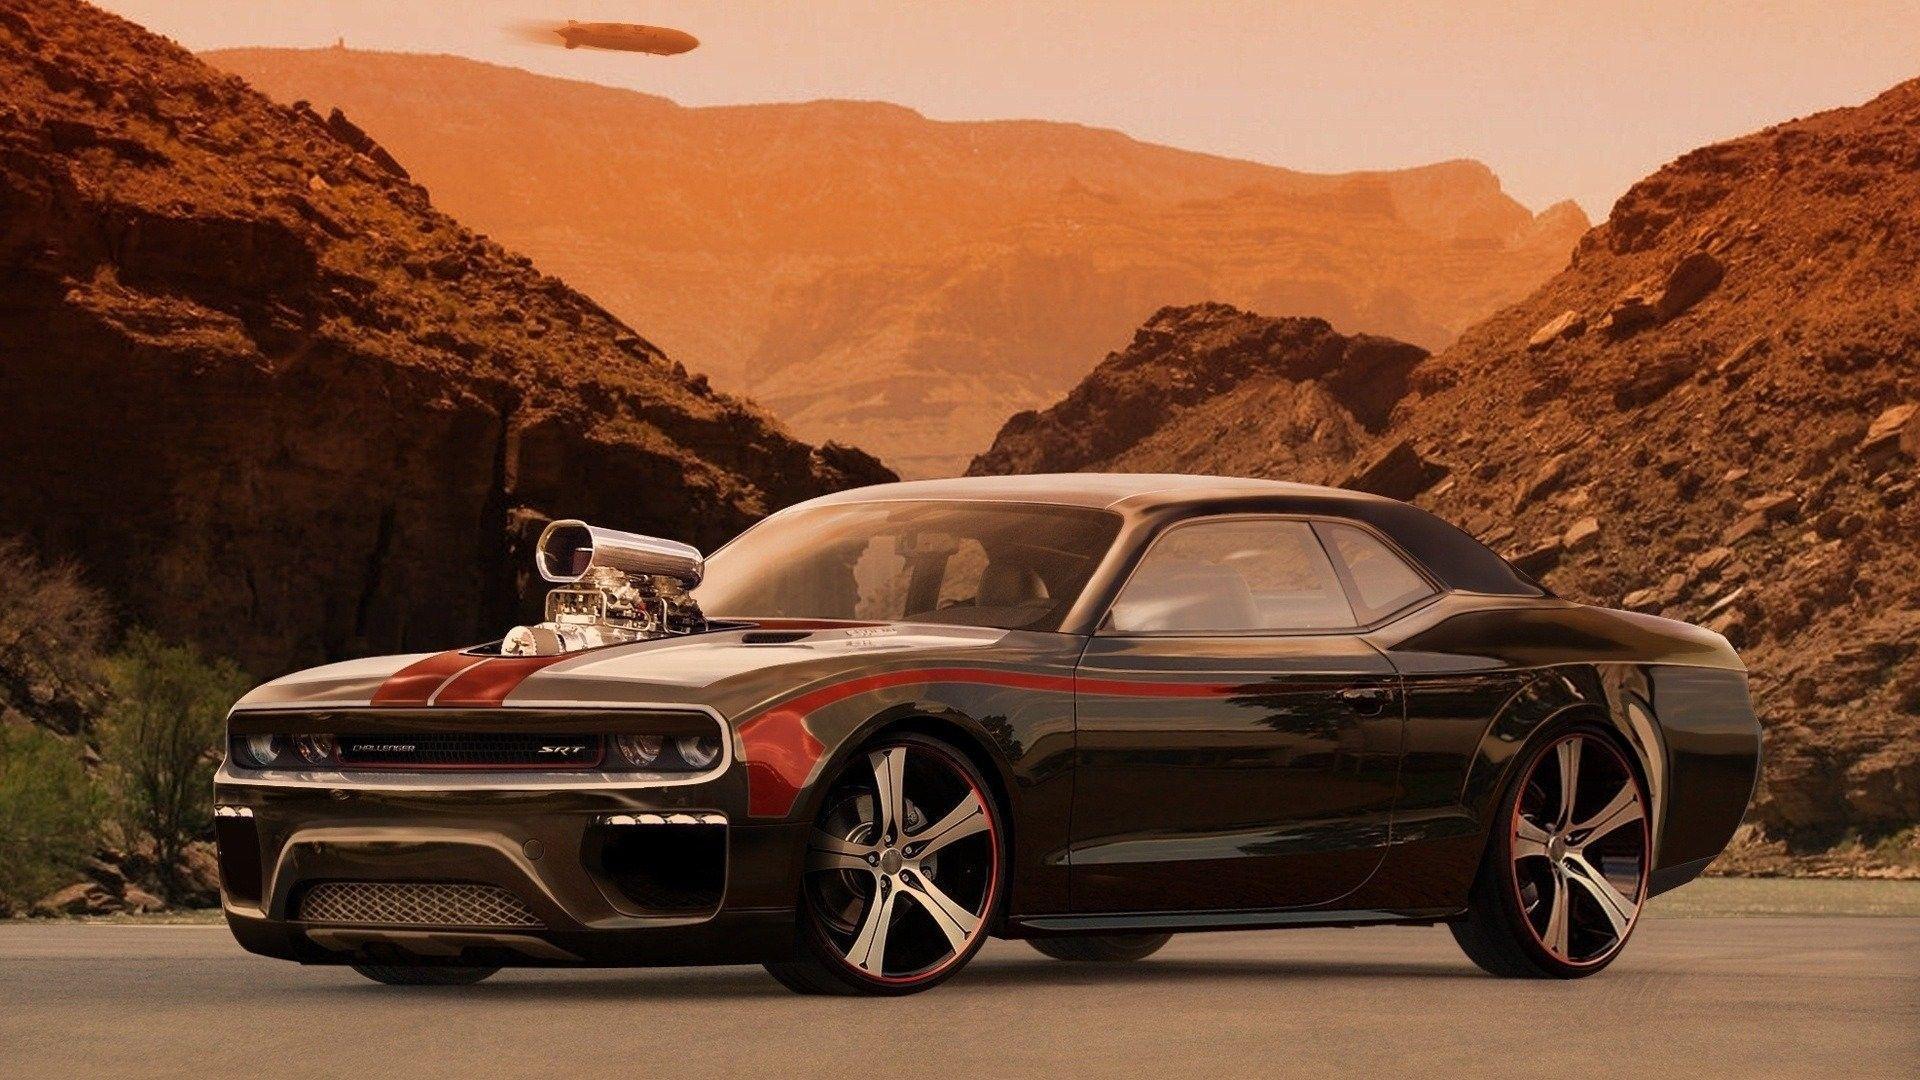 Hd Muscle Car Wallpaper Best TO6 | WALLPAPER CAR HD